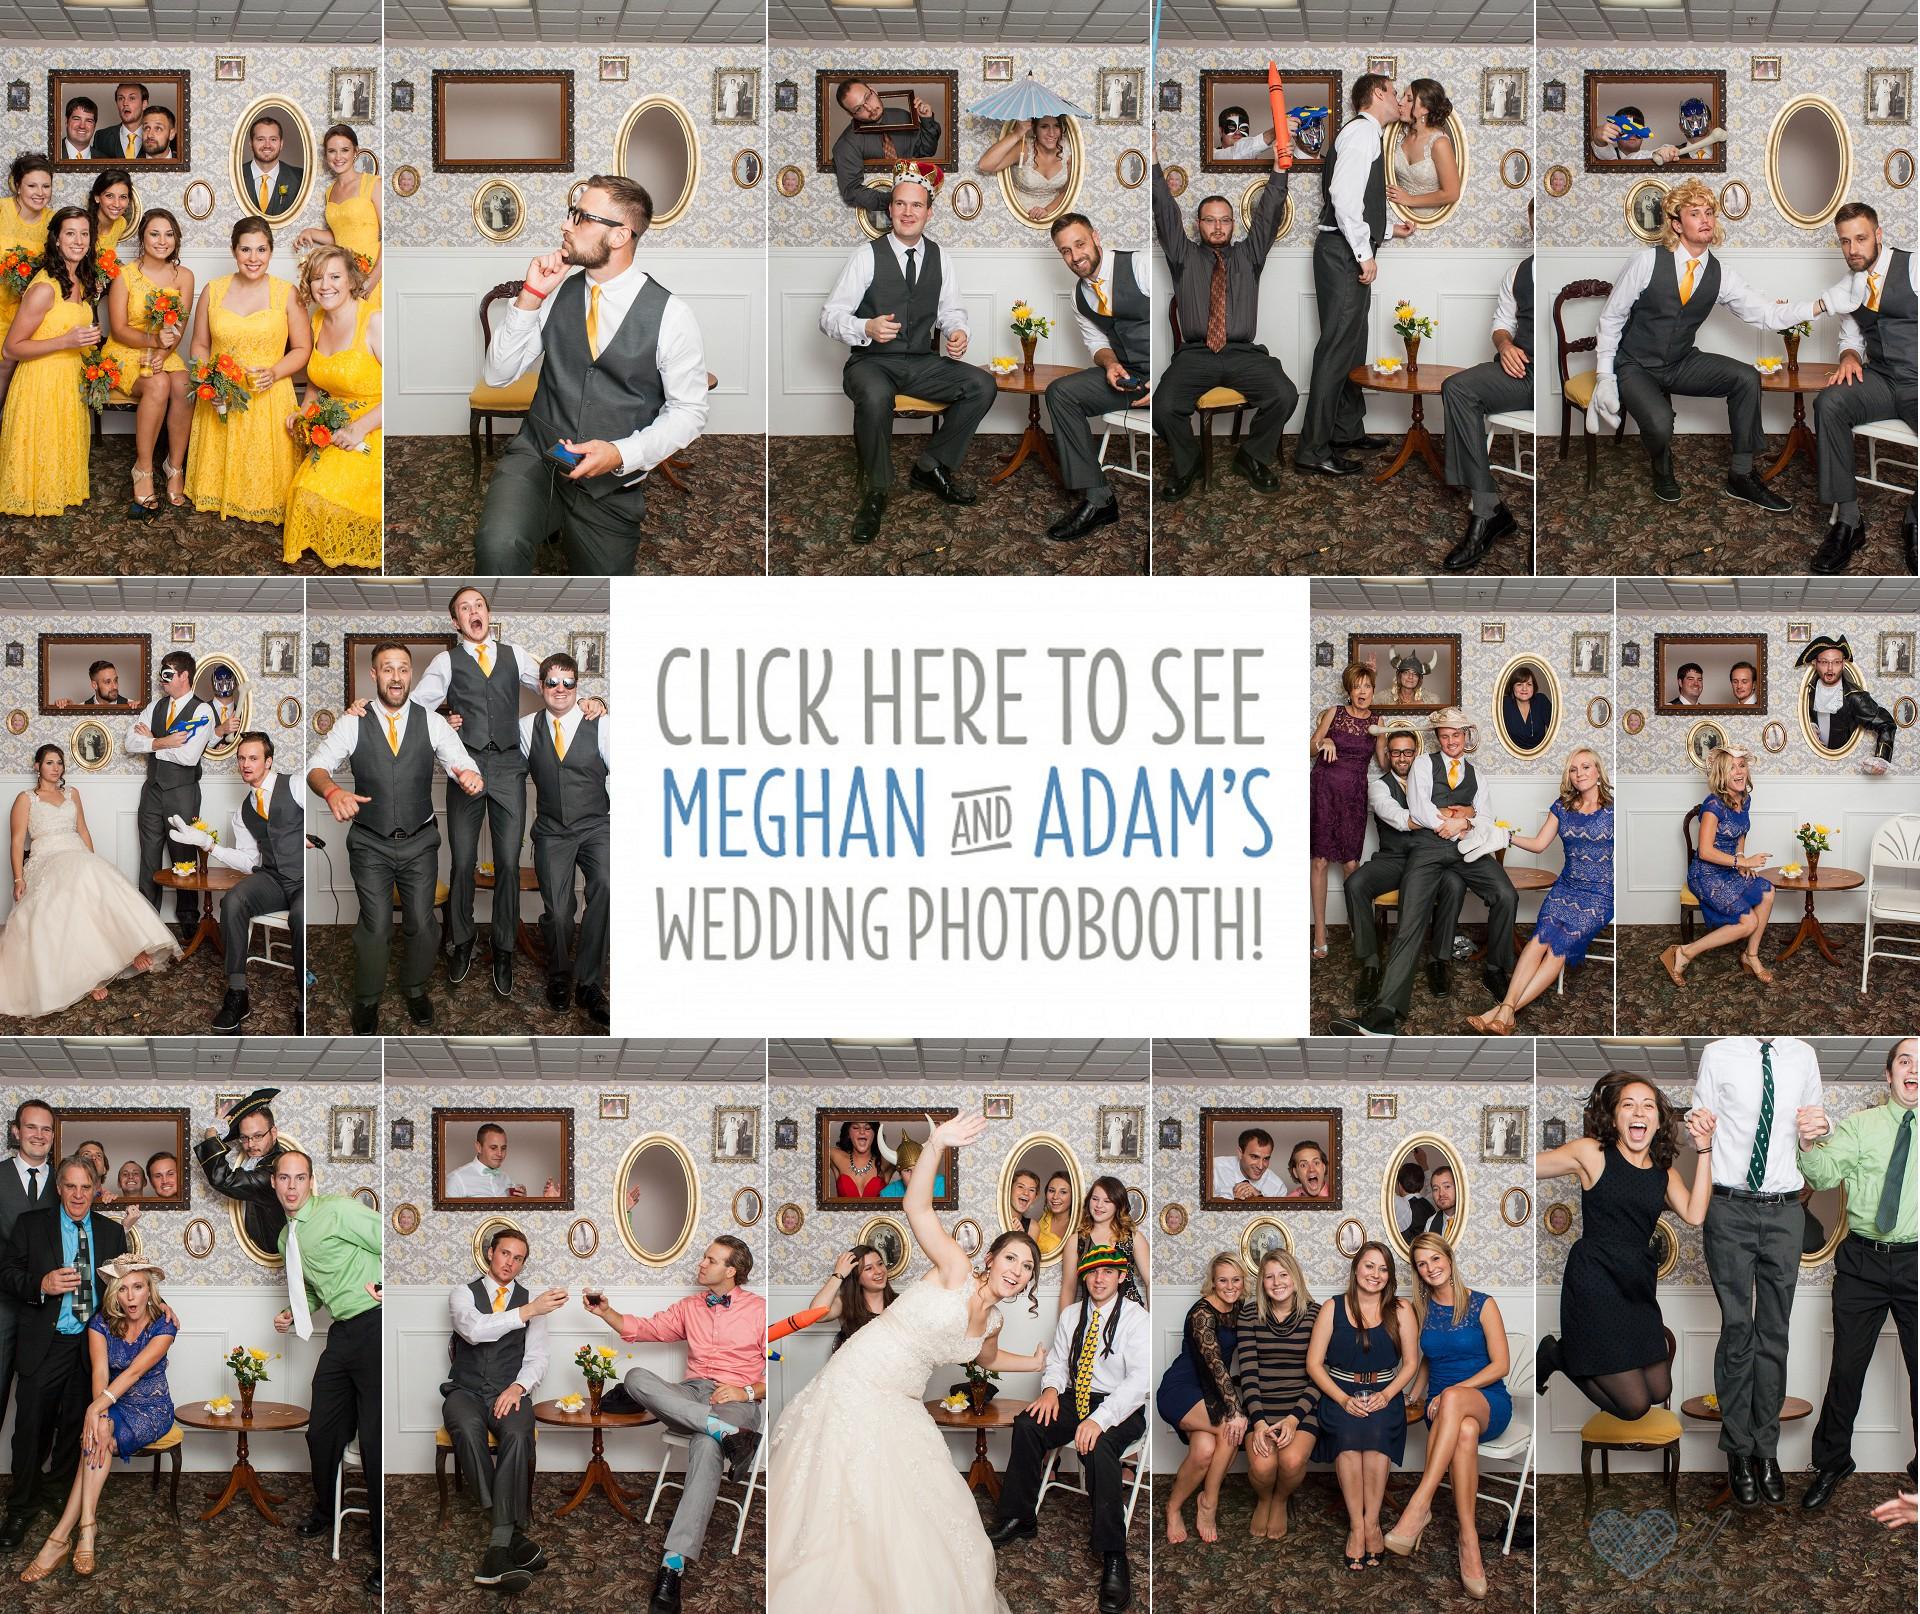 Grand Ledge Wedding Photobooth